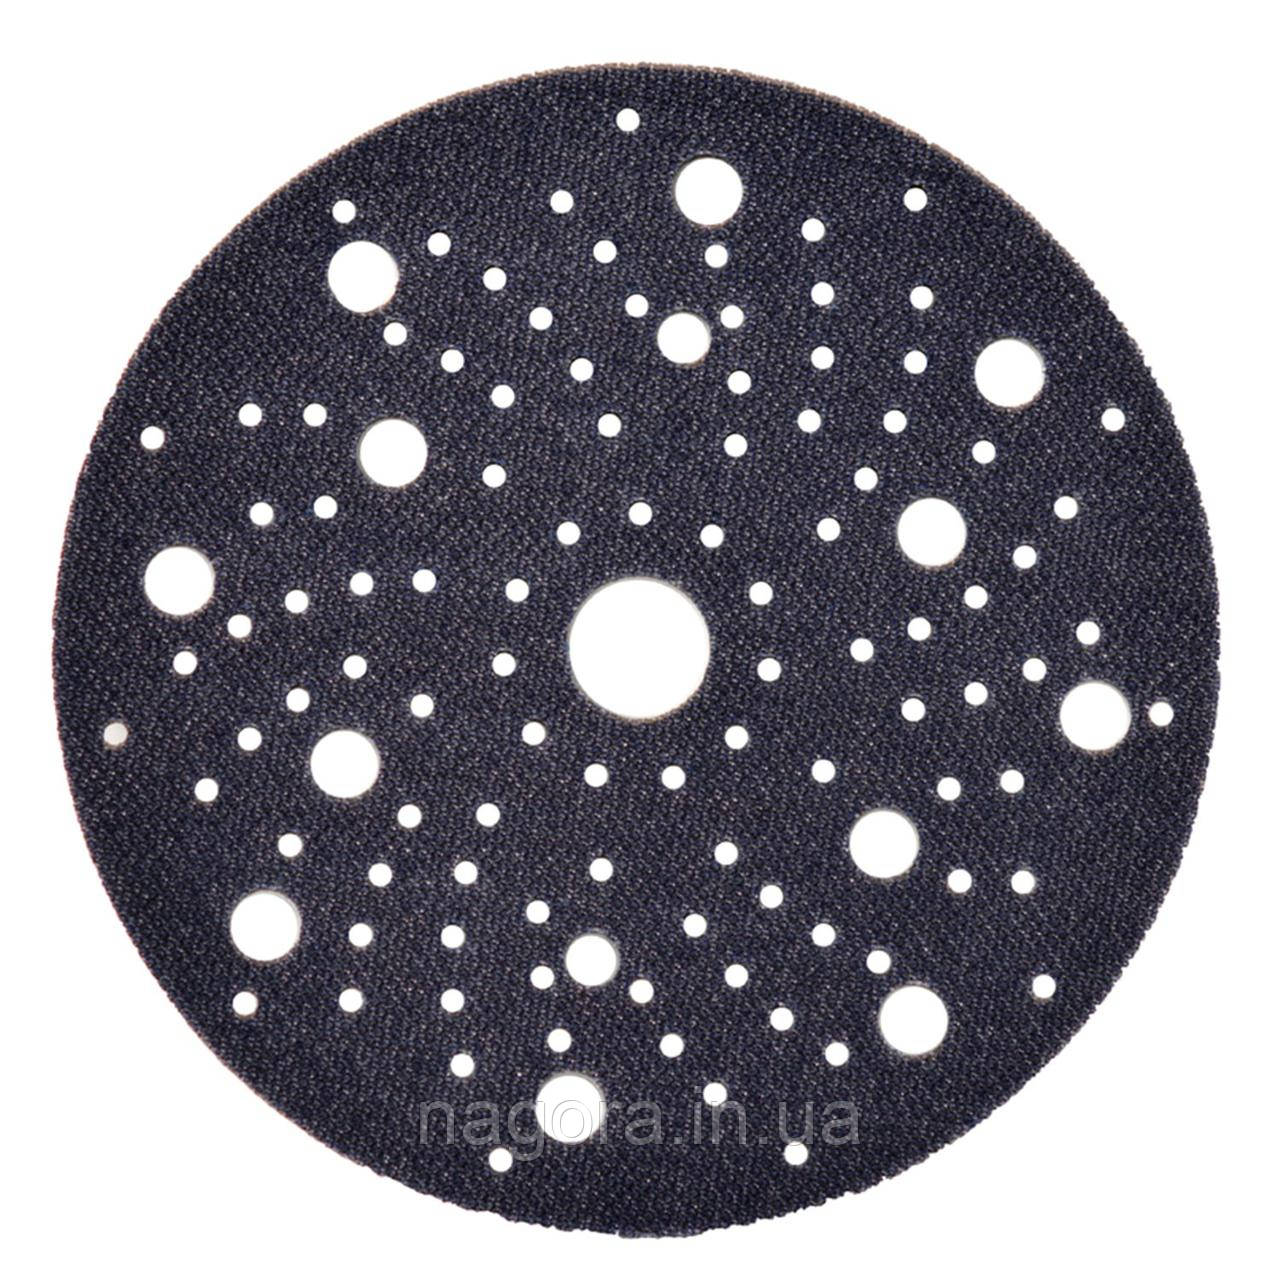 Подложка мультидырочная 3M™ для абразивных кругов Hookit™ ø150мм 5мм мягкая